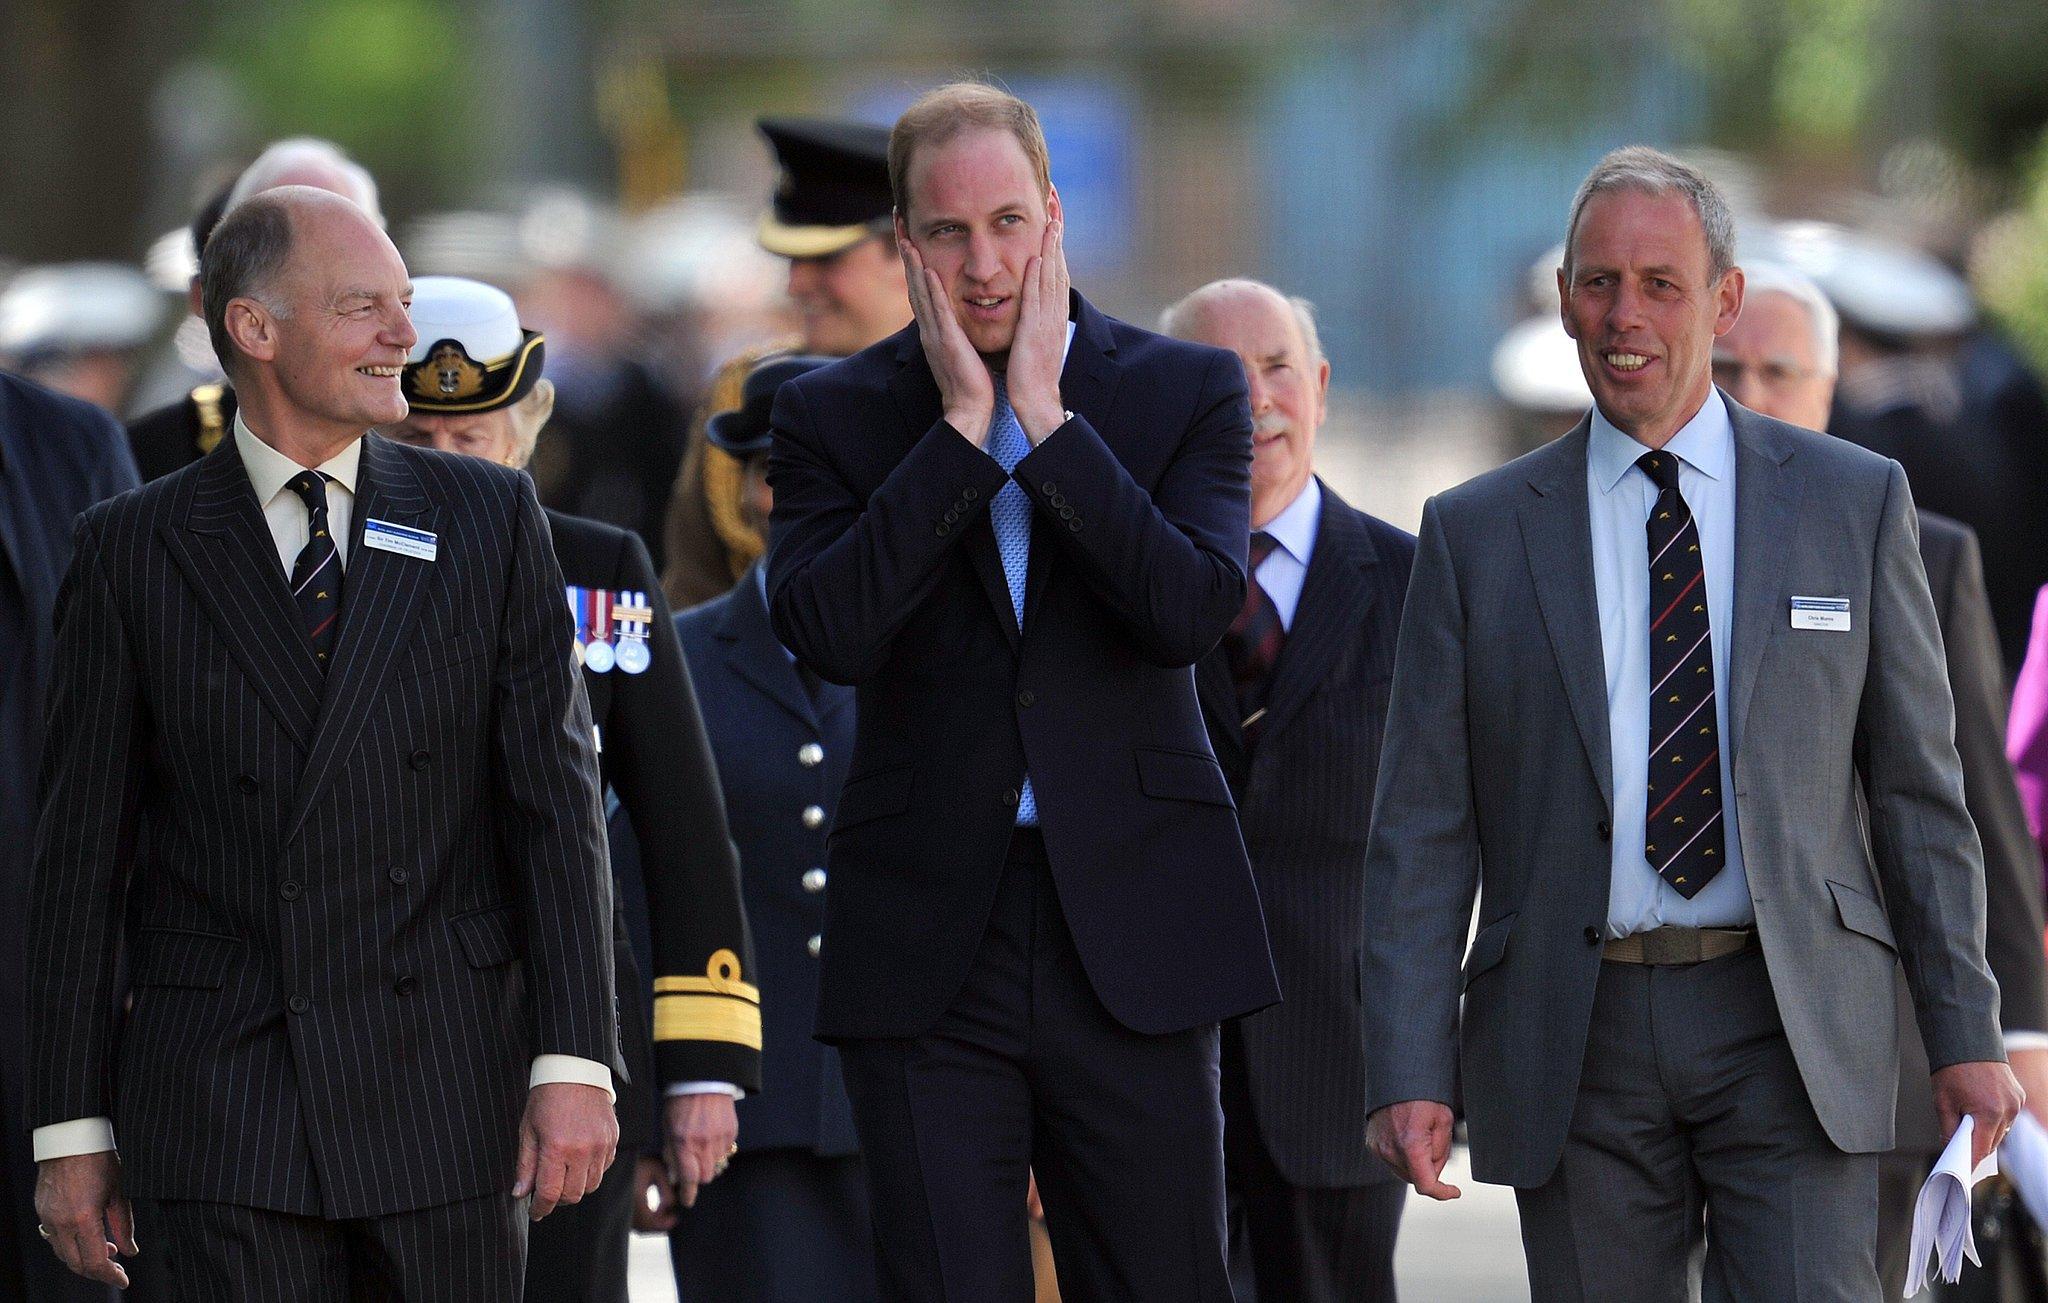 Prince William Drinks on the Job